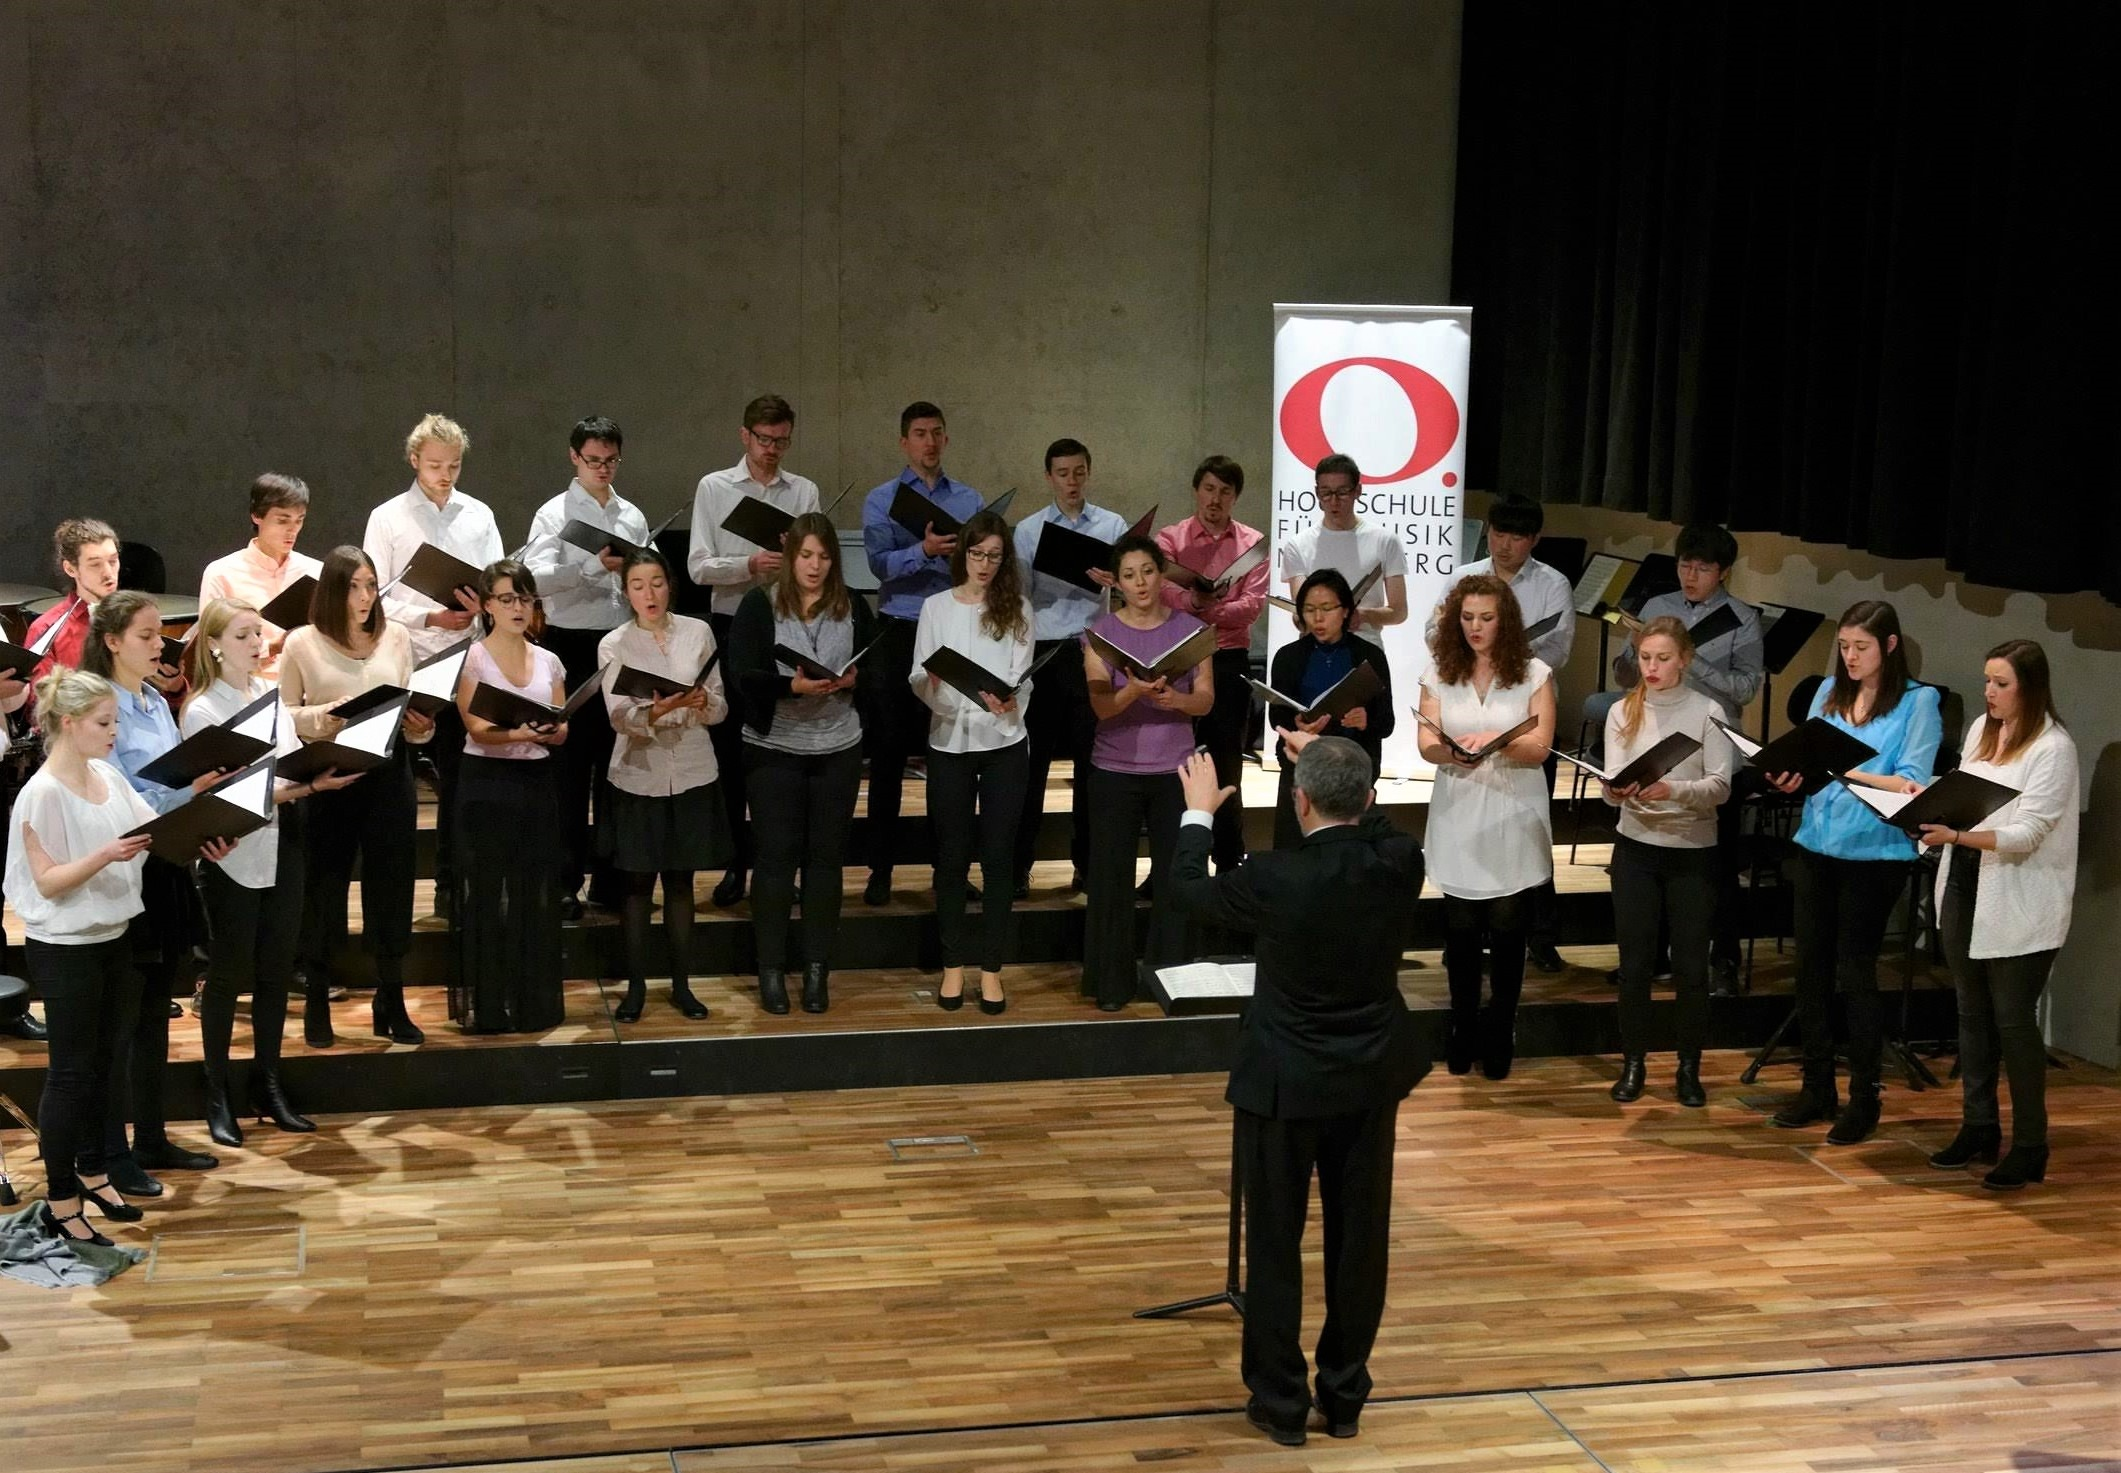 chor_hochschule_für_musik_nürnberg